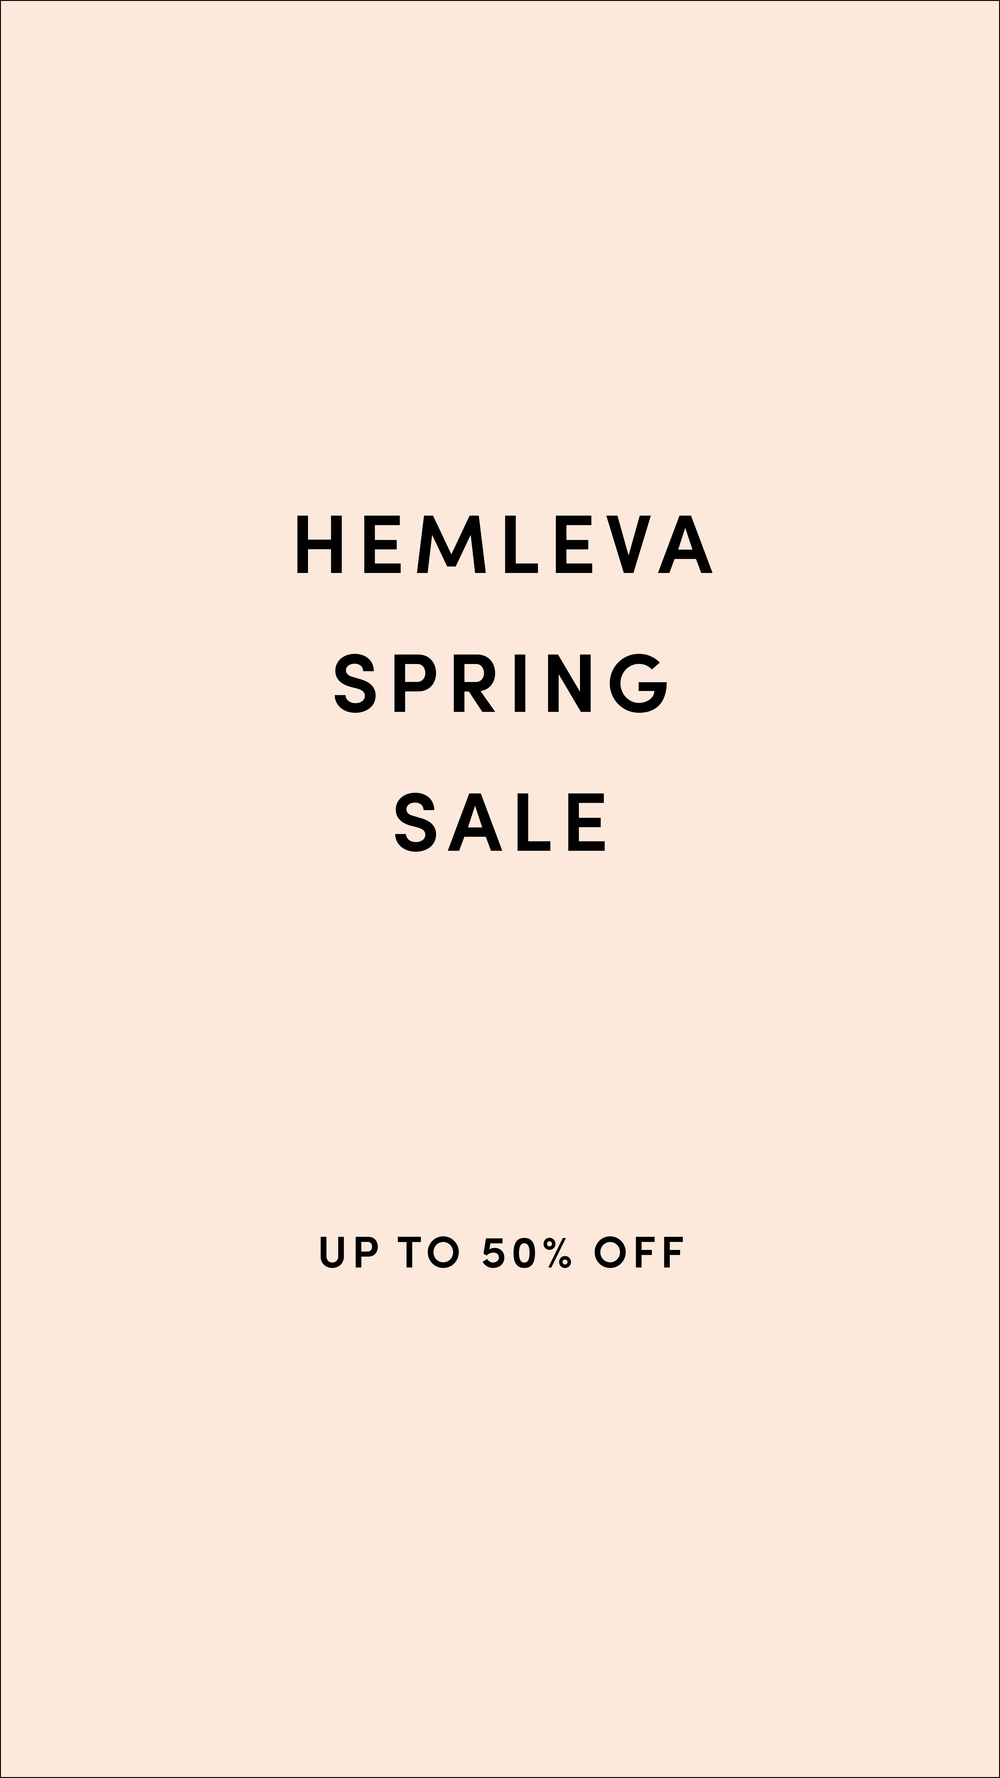 HEMLEVA Spring Sale.png